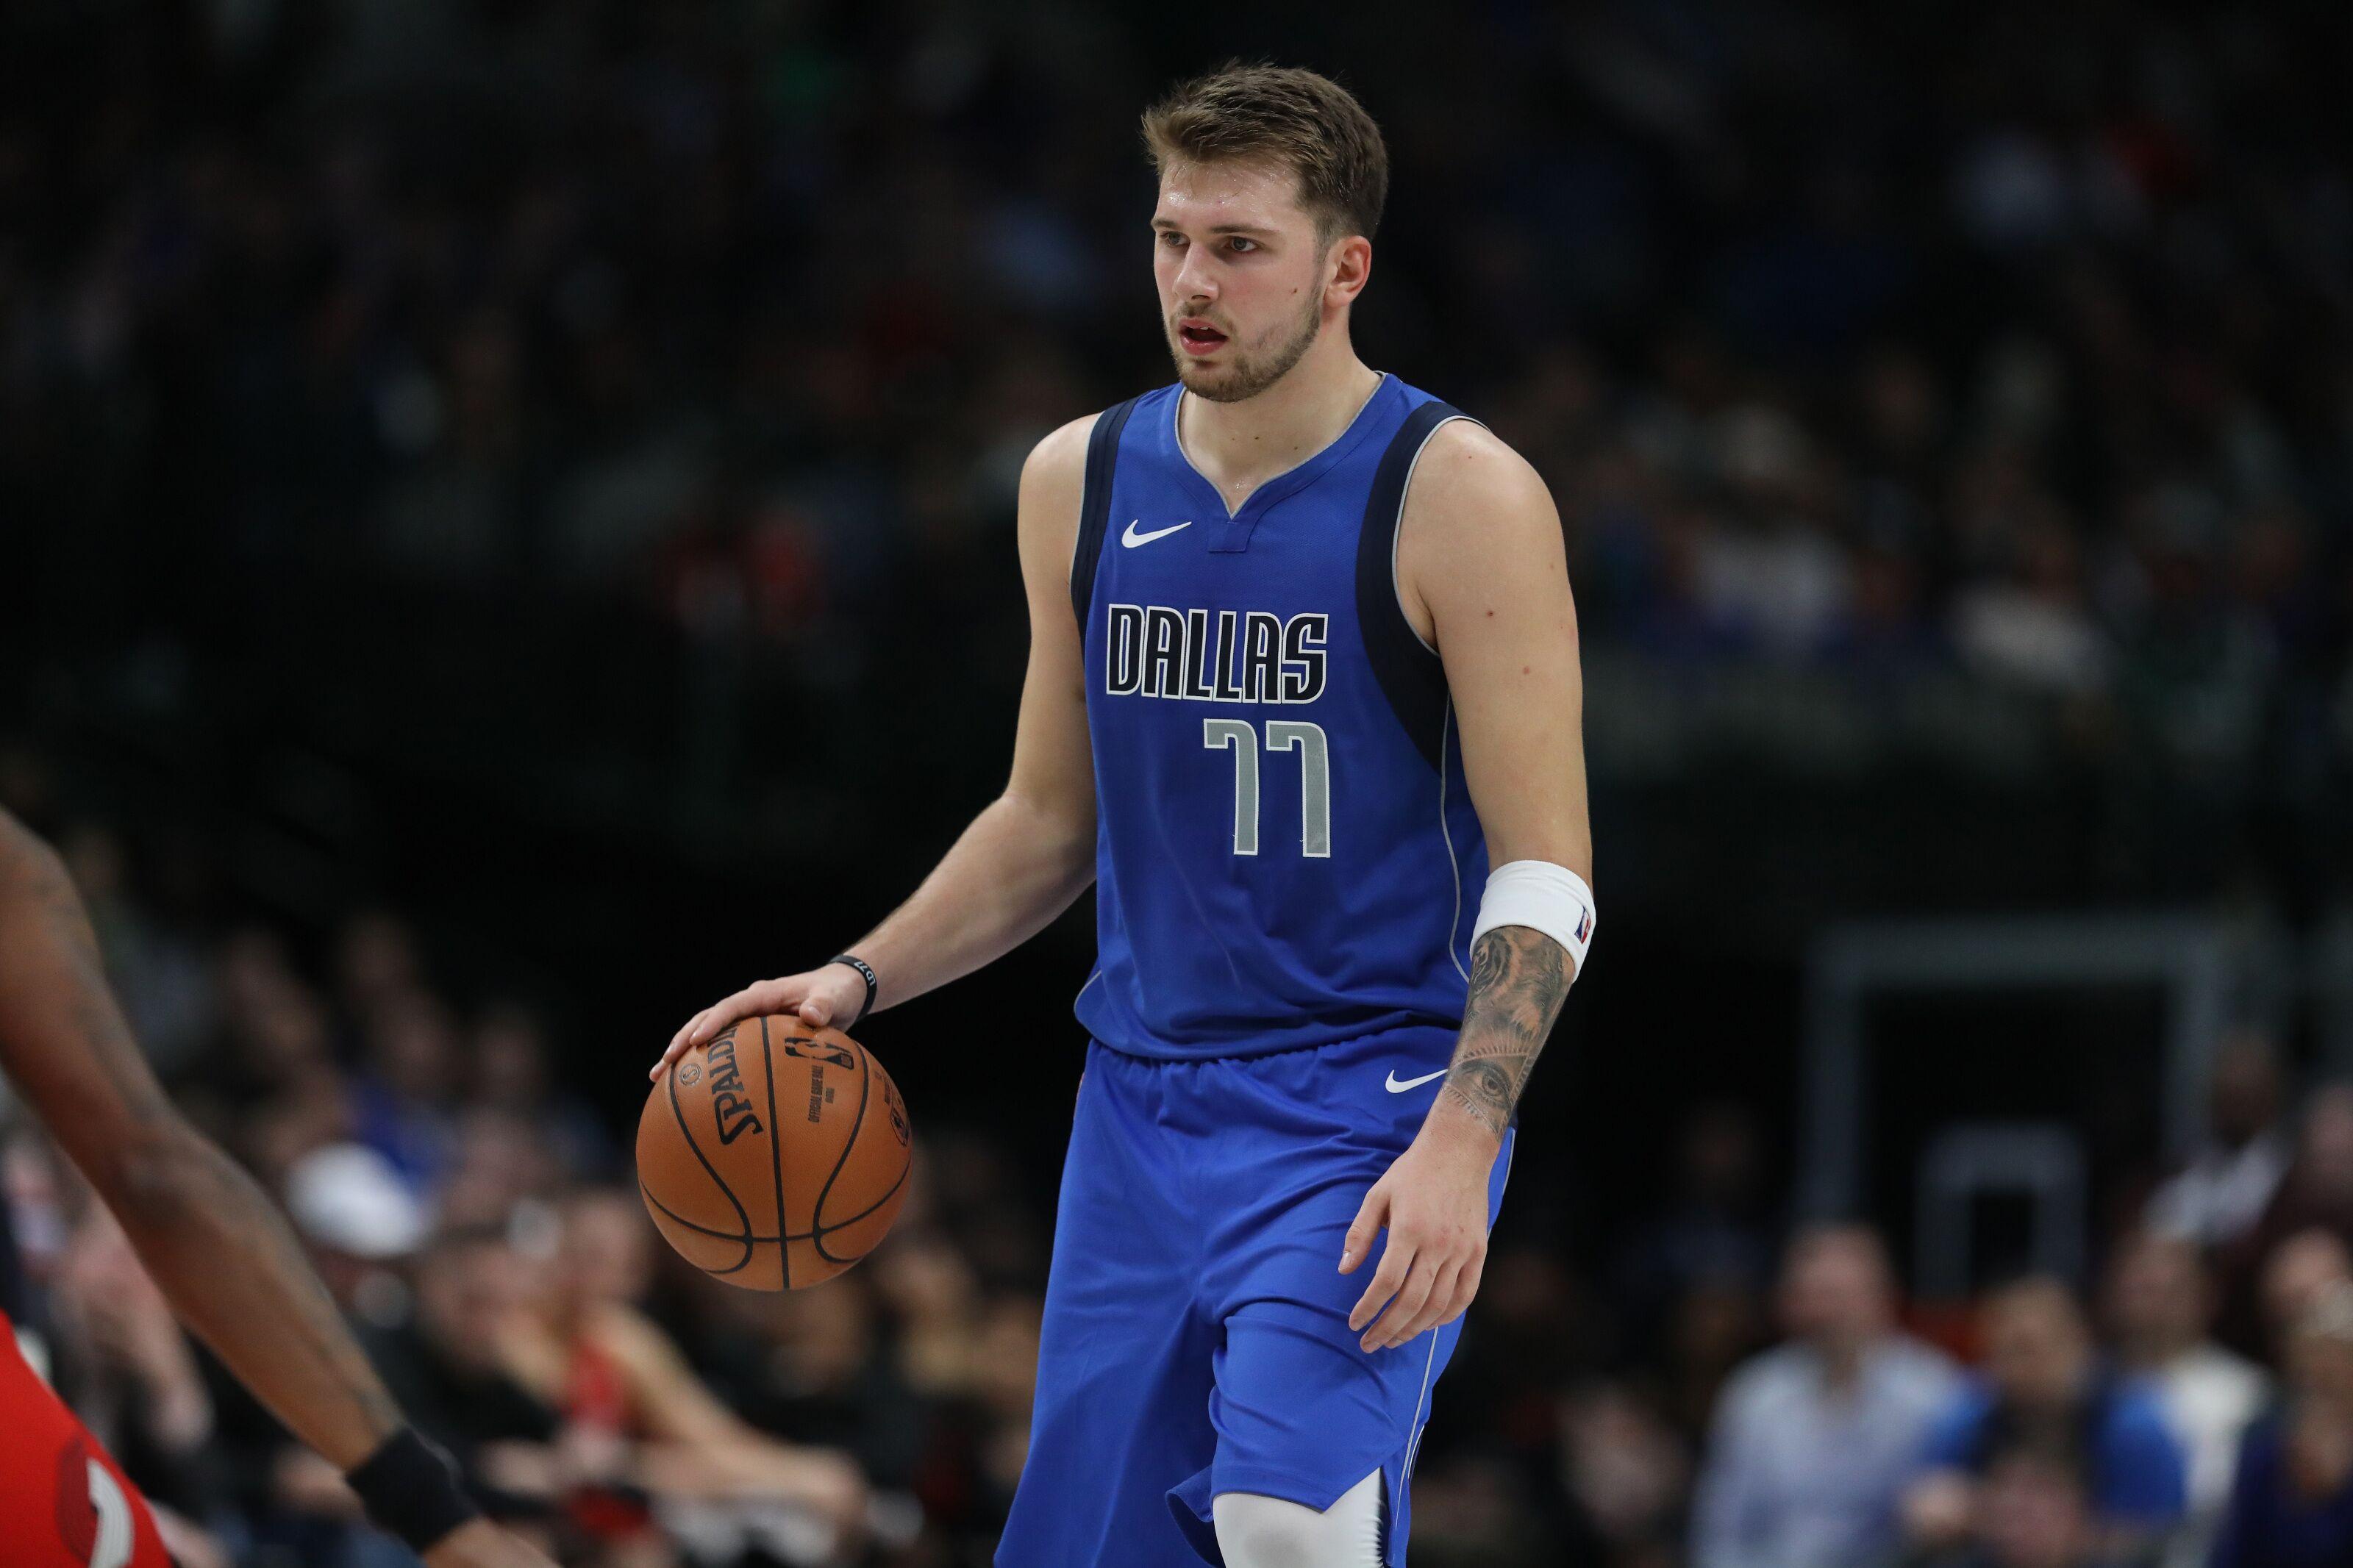 Dallas Mavericks: Has Luka Doncic underperformed in 2019-20?